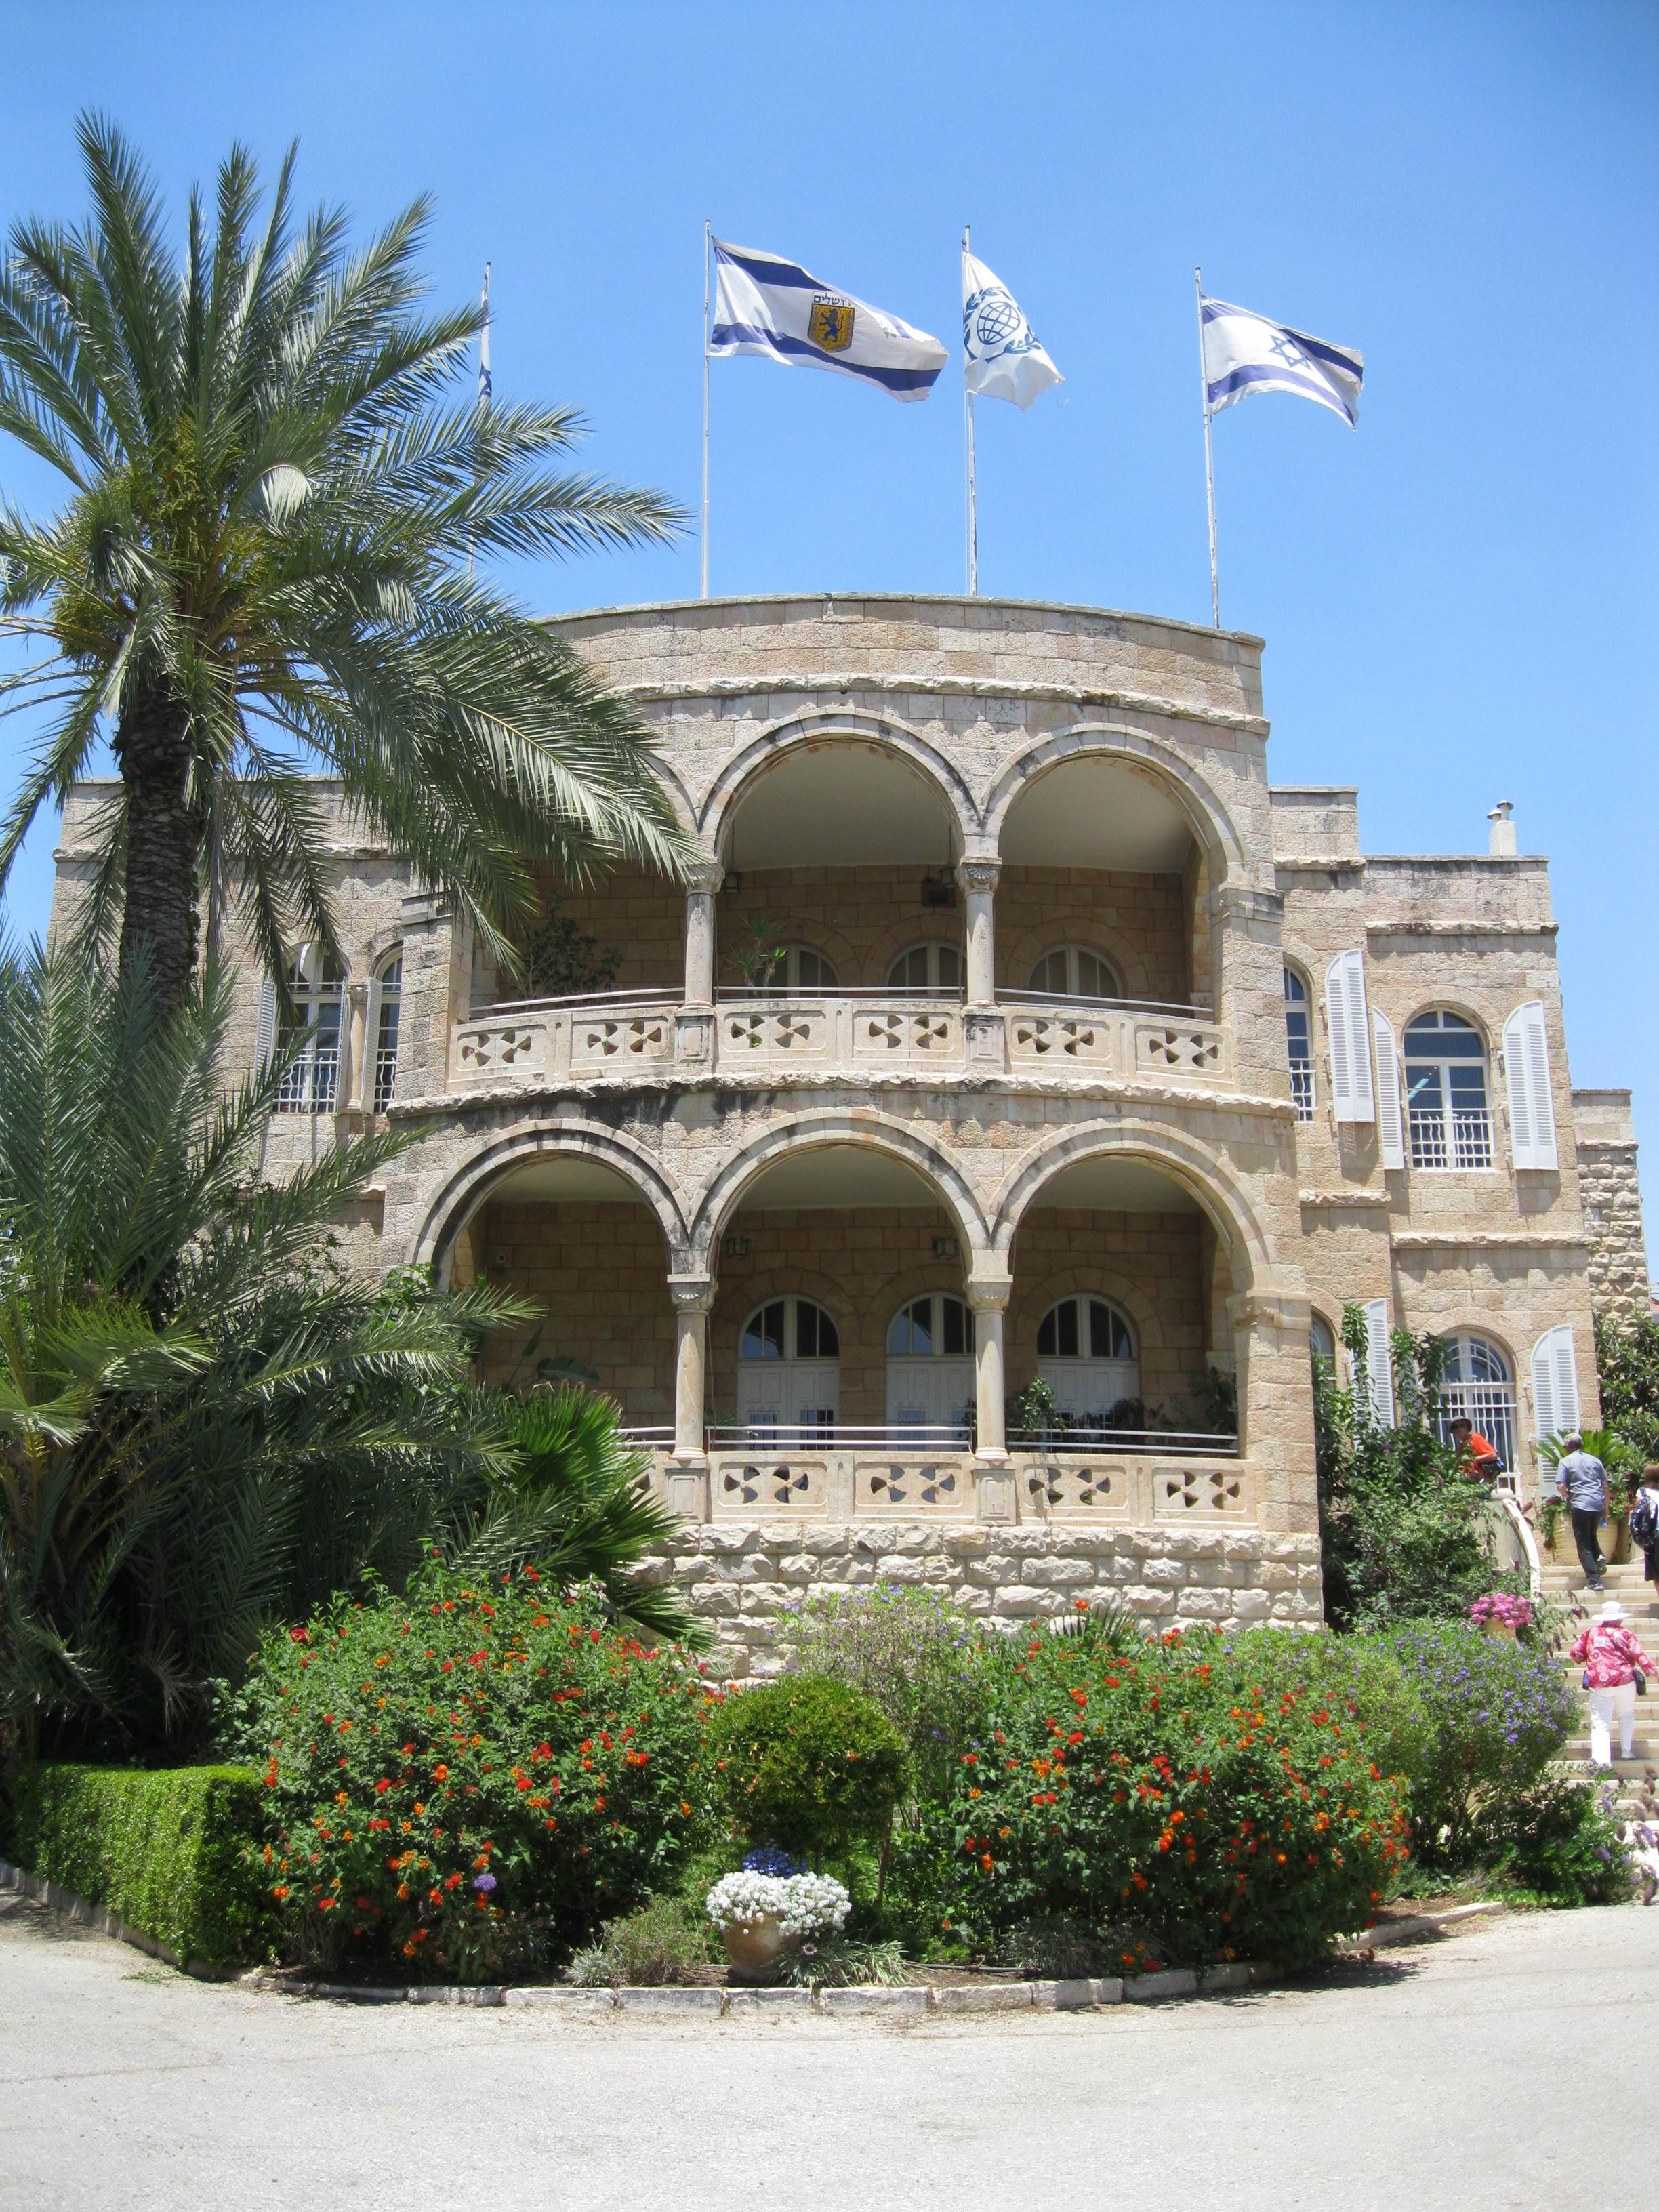 International Christian Embassy Jerusalem headquarters office